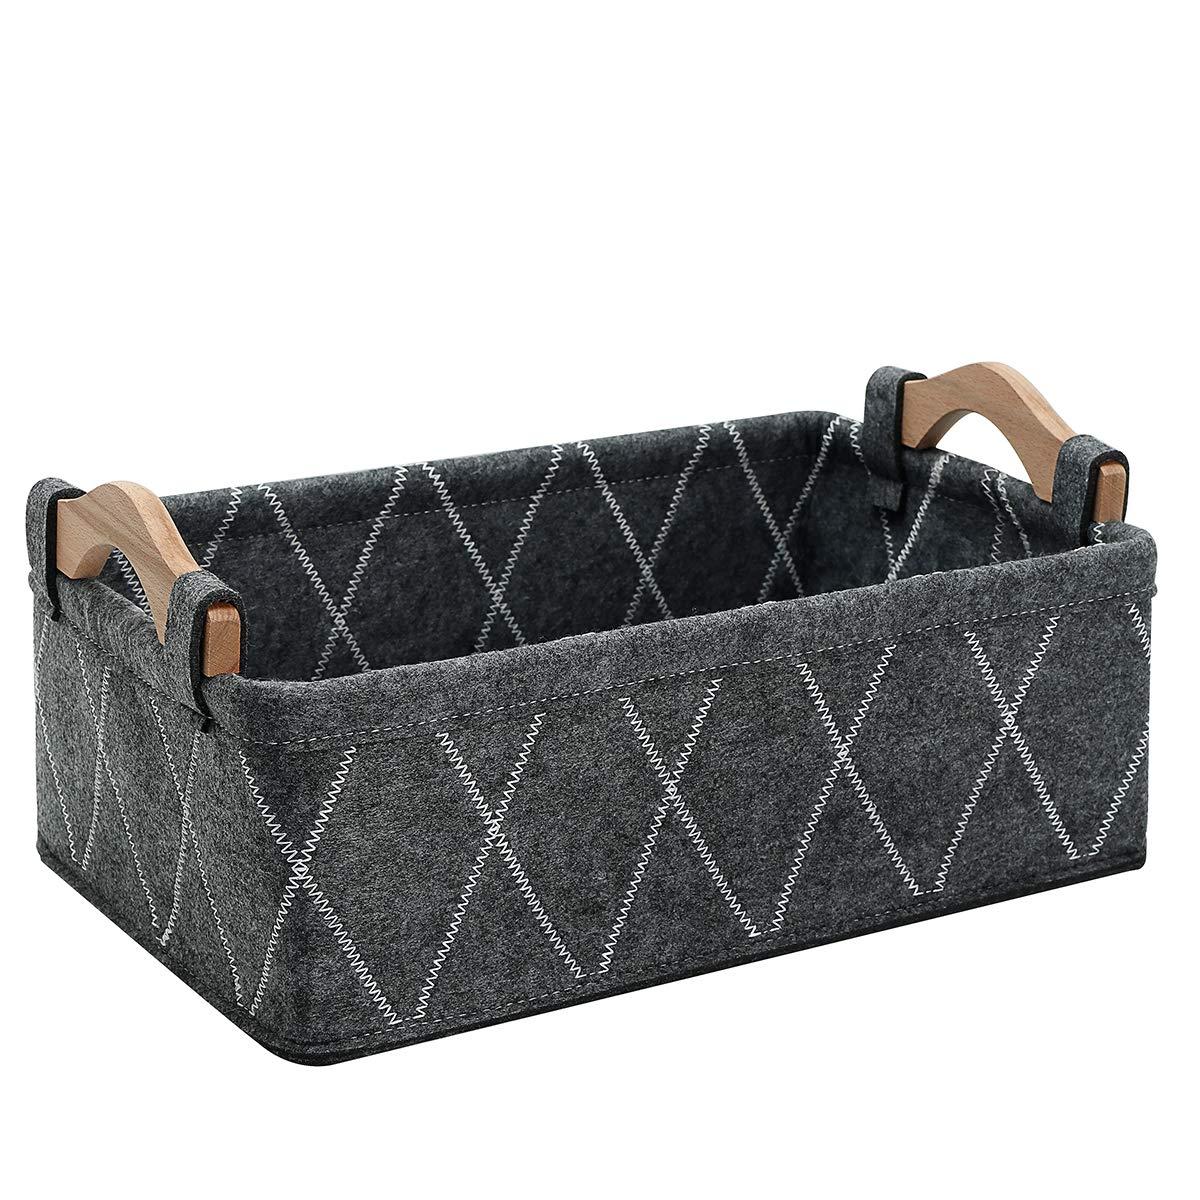 Small Baskets Fabric Bin Felt Empty Gift Basket Nursery Organizer for Makeup Cosmetics Underwear Socks Bra Collapsible Basket Home Decor